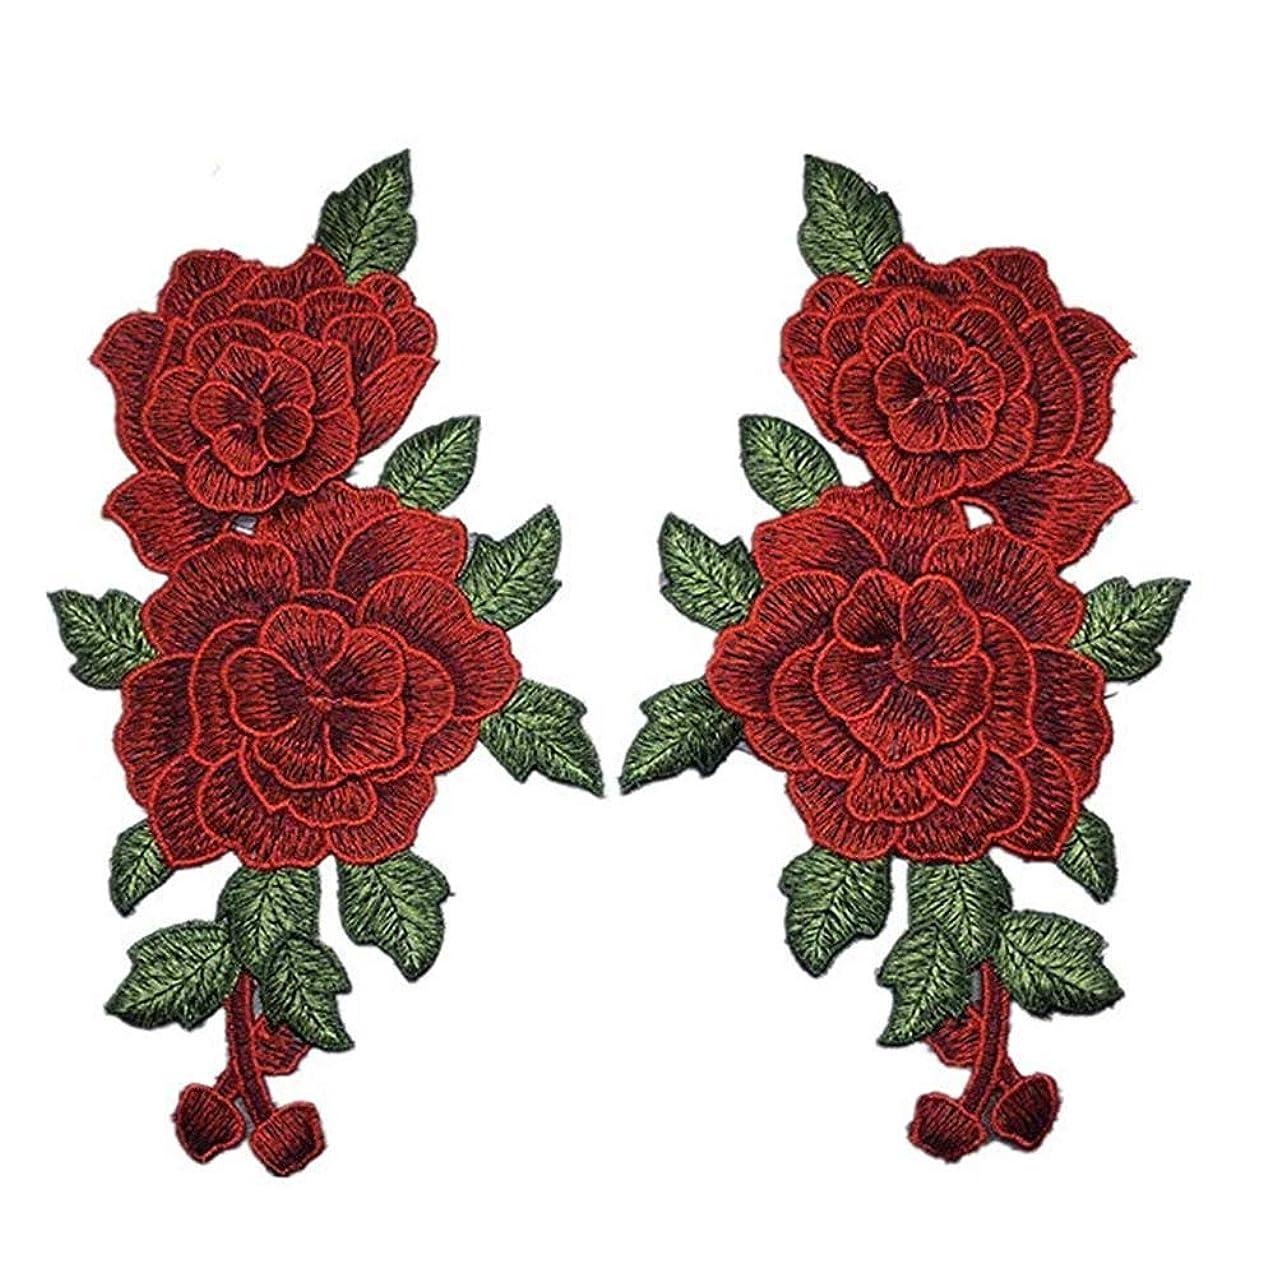 Cubyee Premium 3D Manual Embroidery Appliques, [2pcs] Rose Flower Decorative Patches for Jeans Pants Tops T-Shirt Dress Bags Shoes Hats etc.(Red)